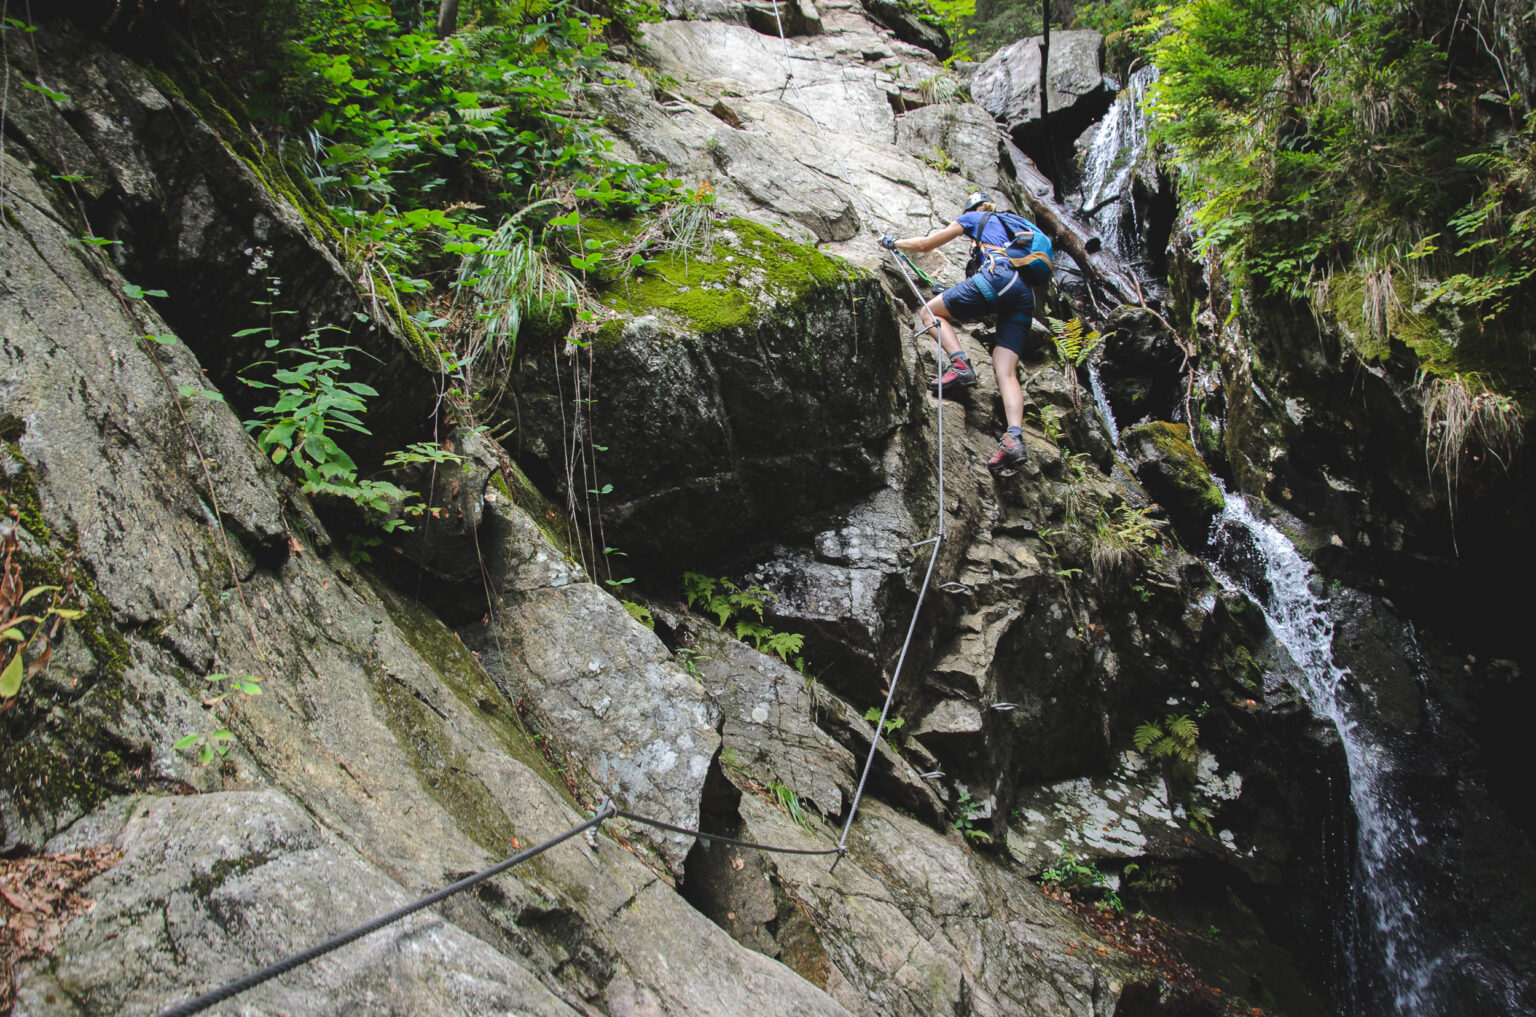 Ola wspina się po skałach ferraty HZS Martinske Hole